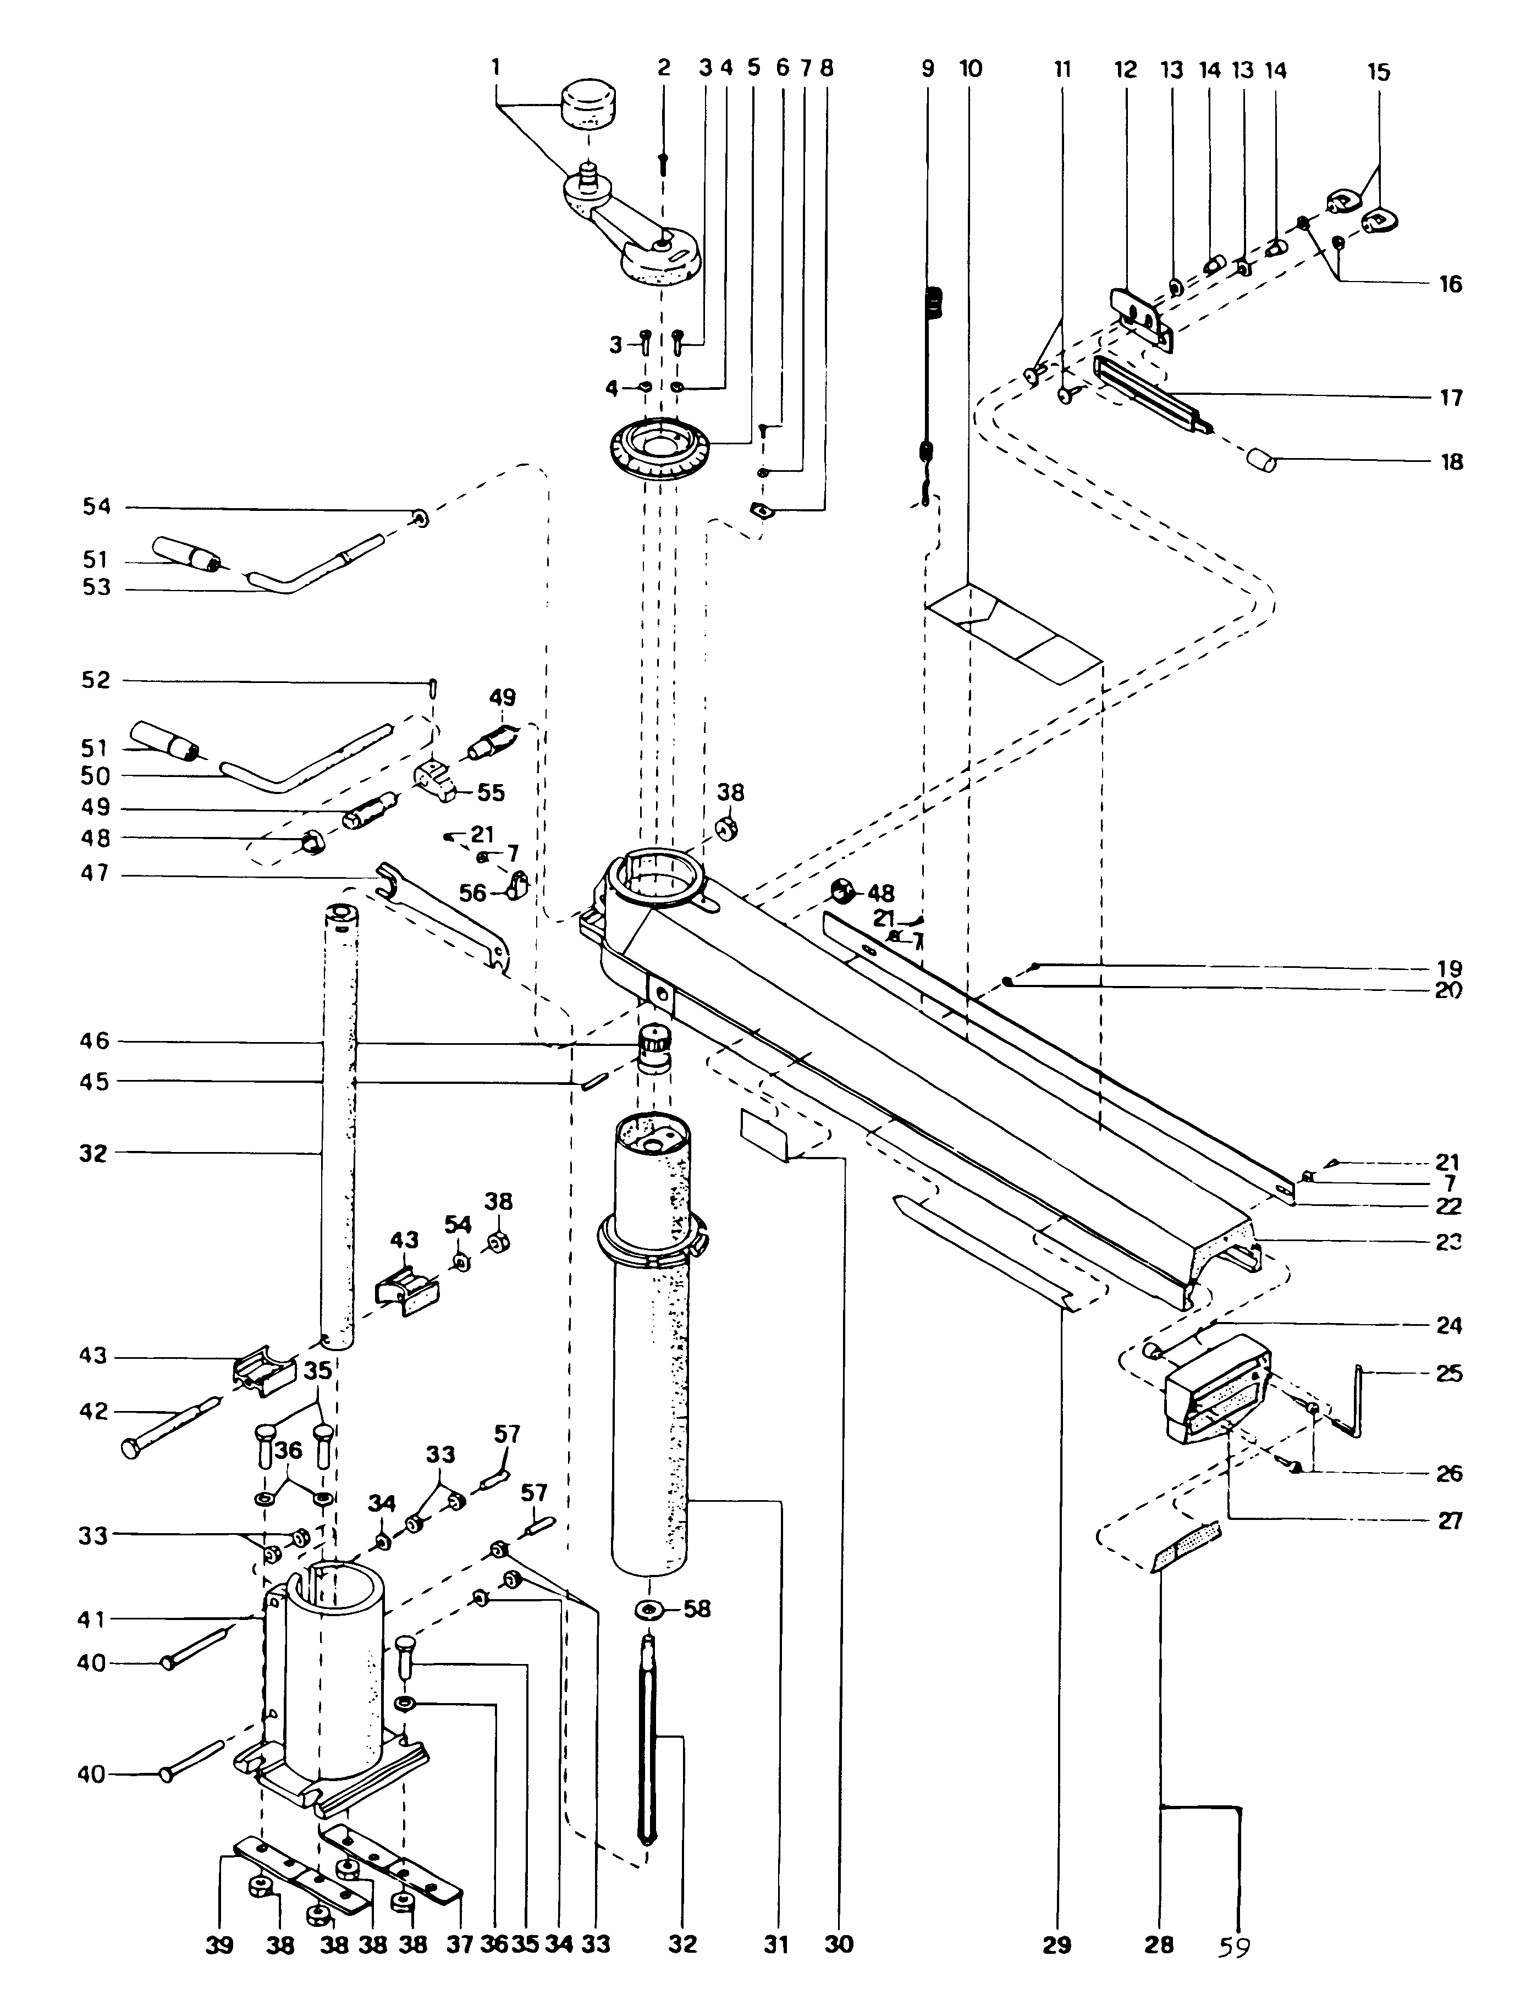 Spares for Dewalt Dw8001----a Radial Arm Saw (type 1